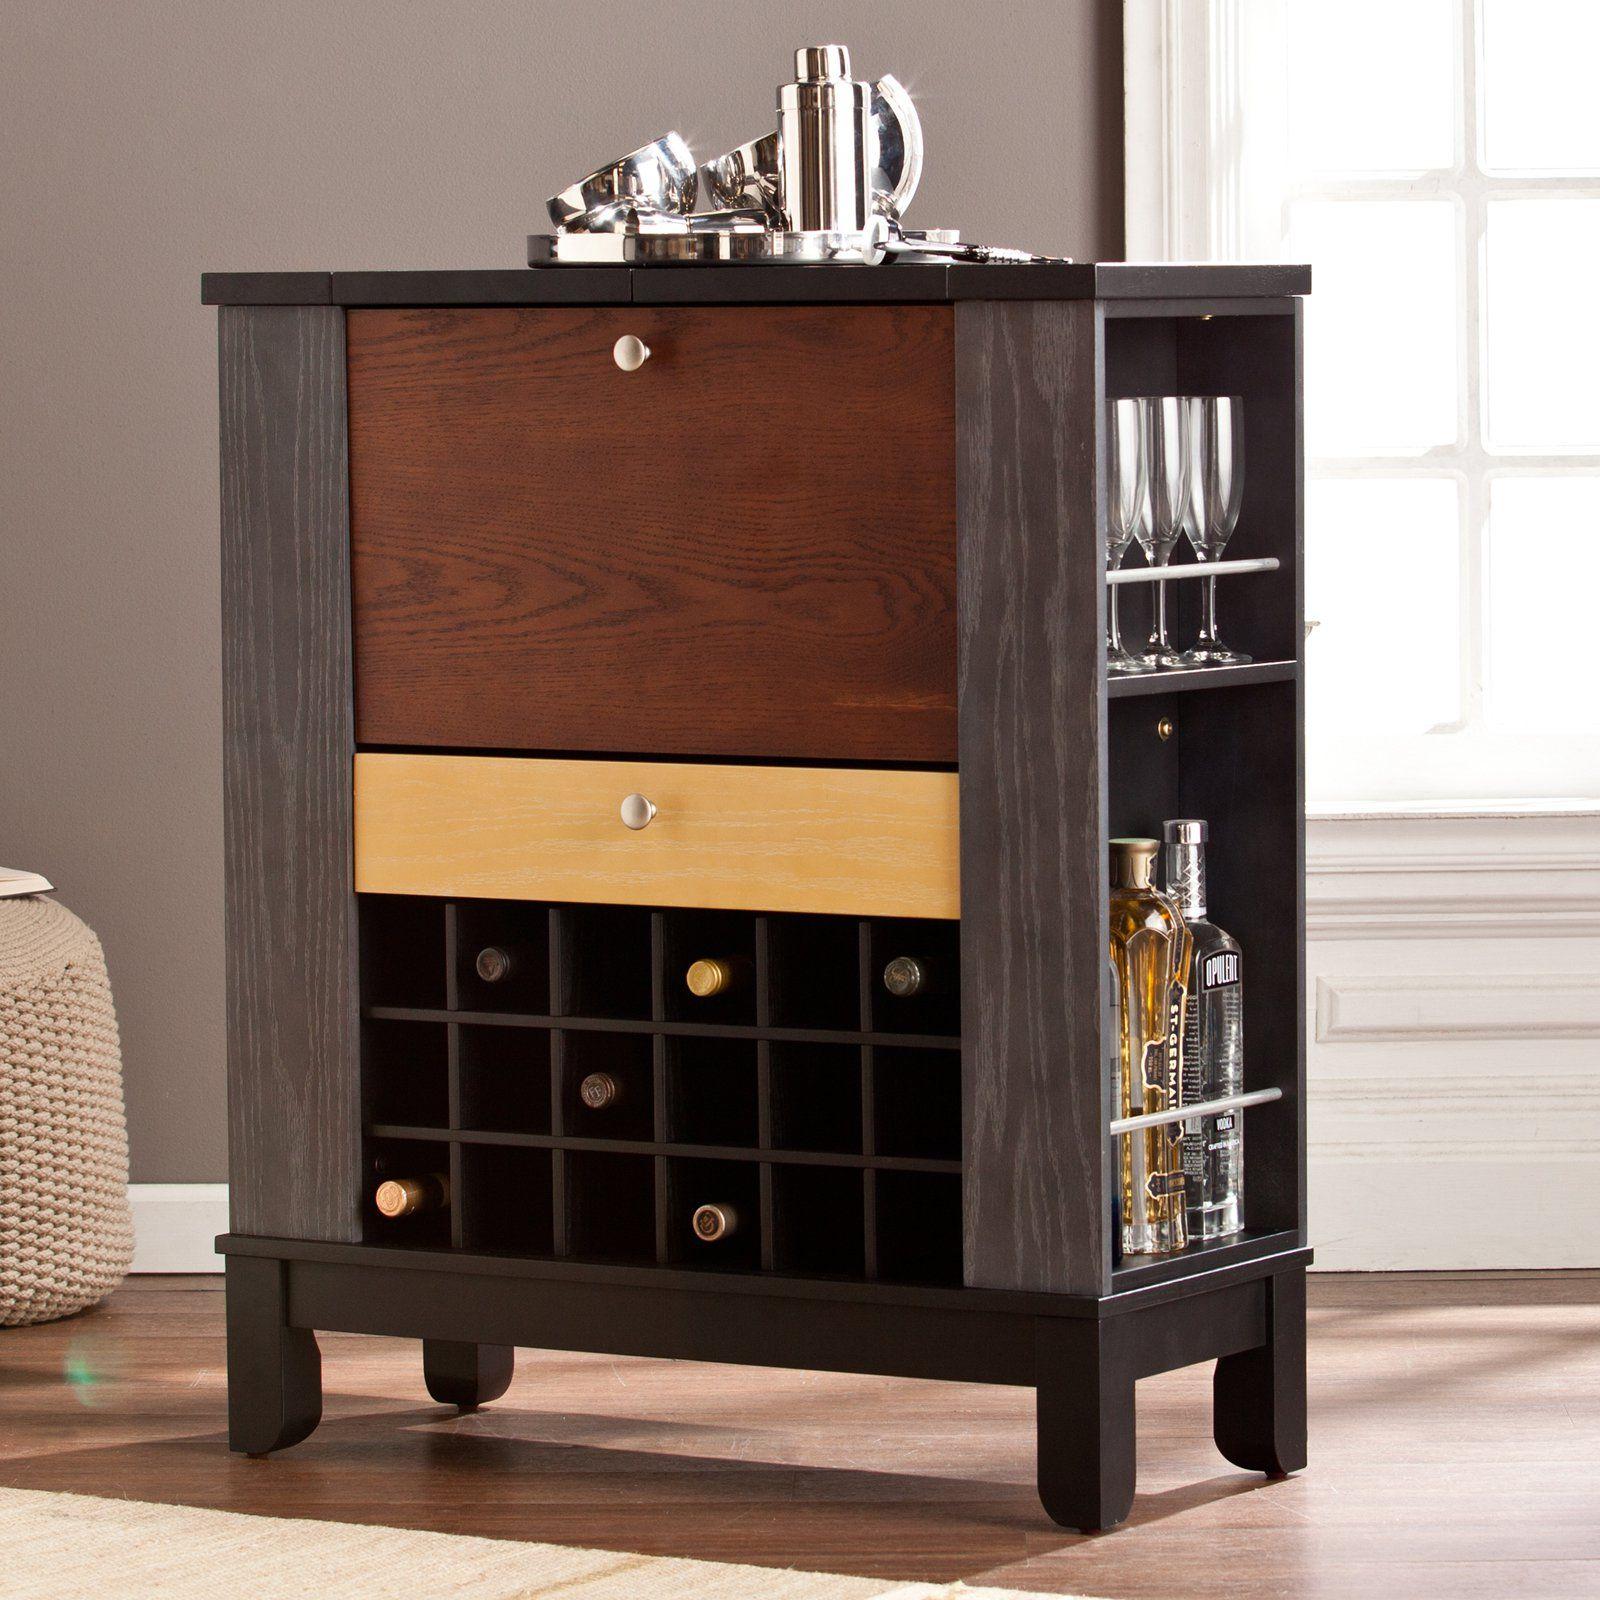 Southern Enterprises Warren Wine/Bar Cabinet | from hayneedle.com